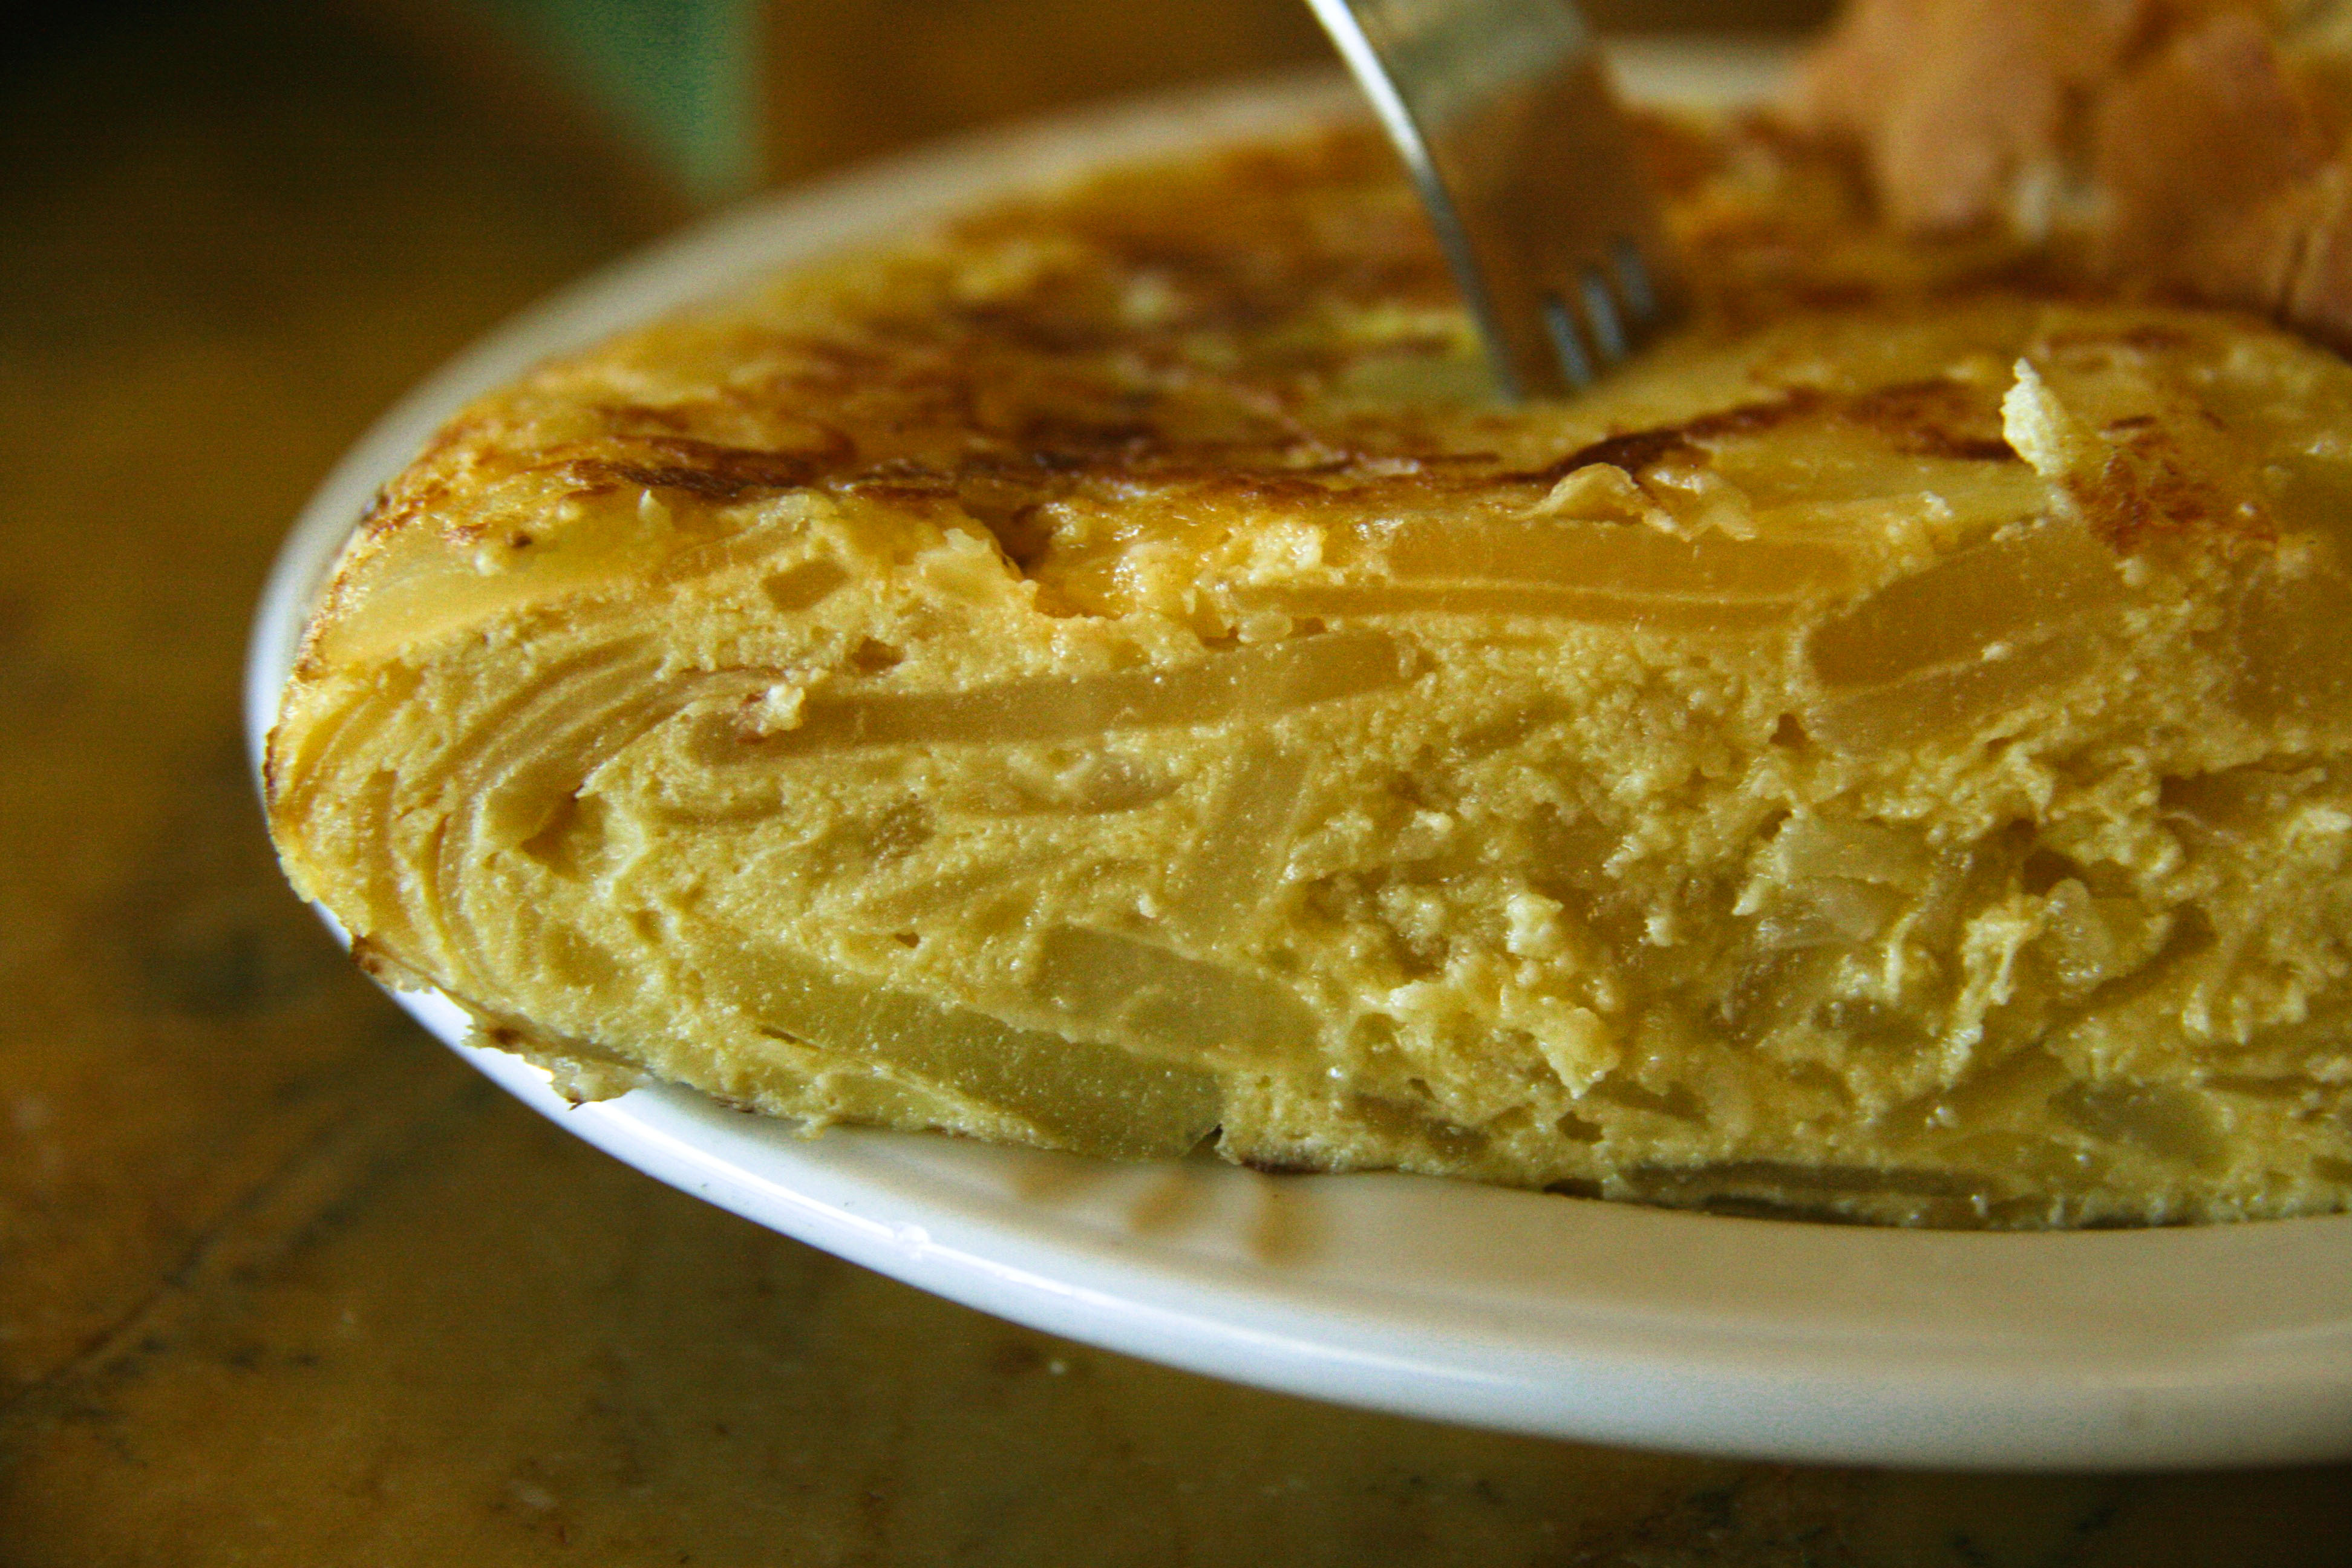 File:Tortilla de Patatas (Corte transversal).jpg